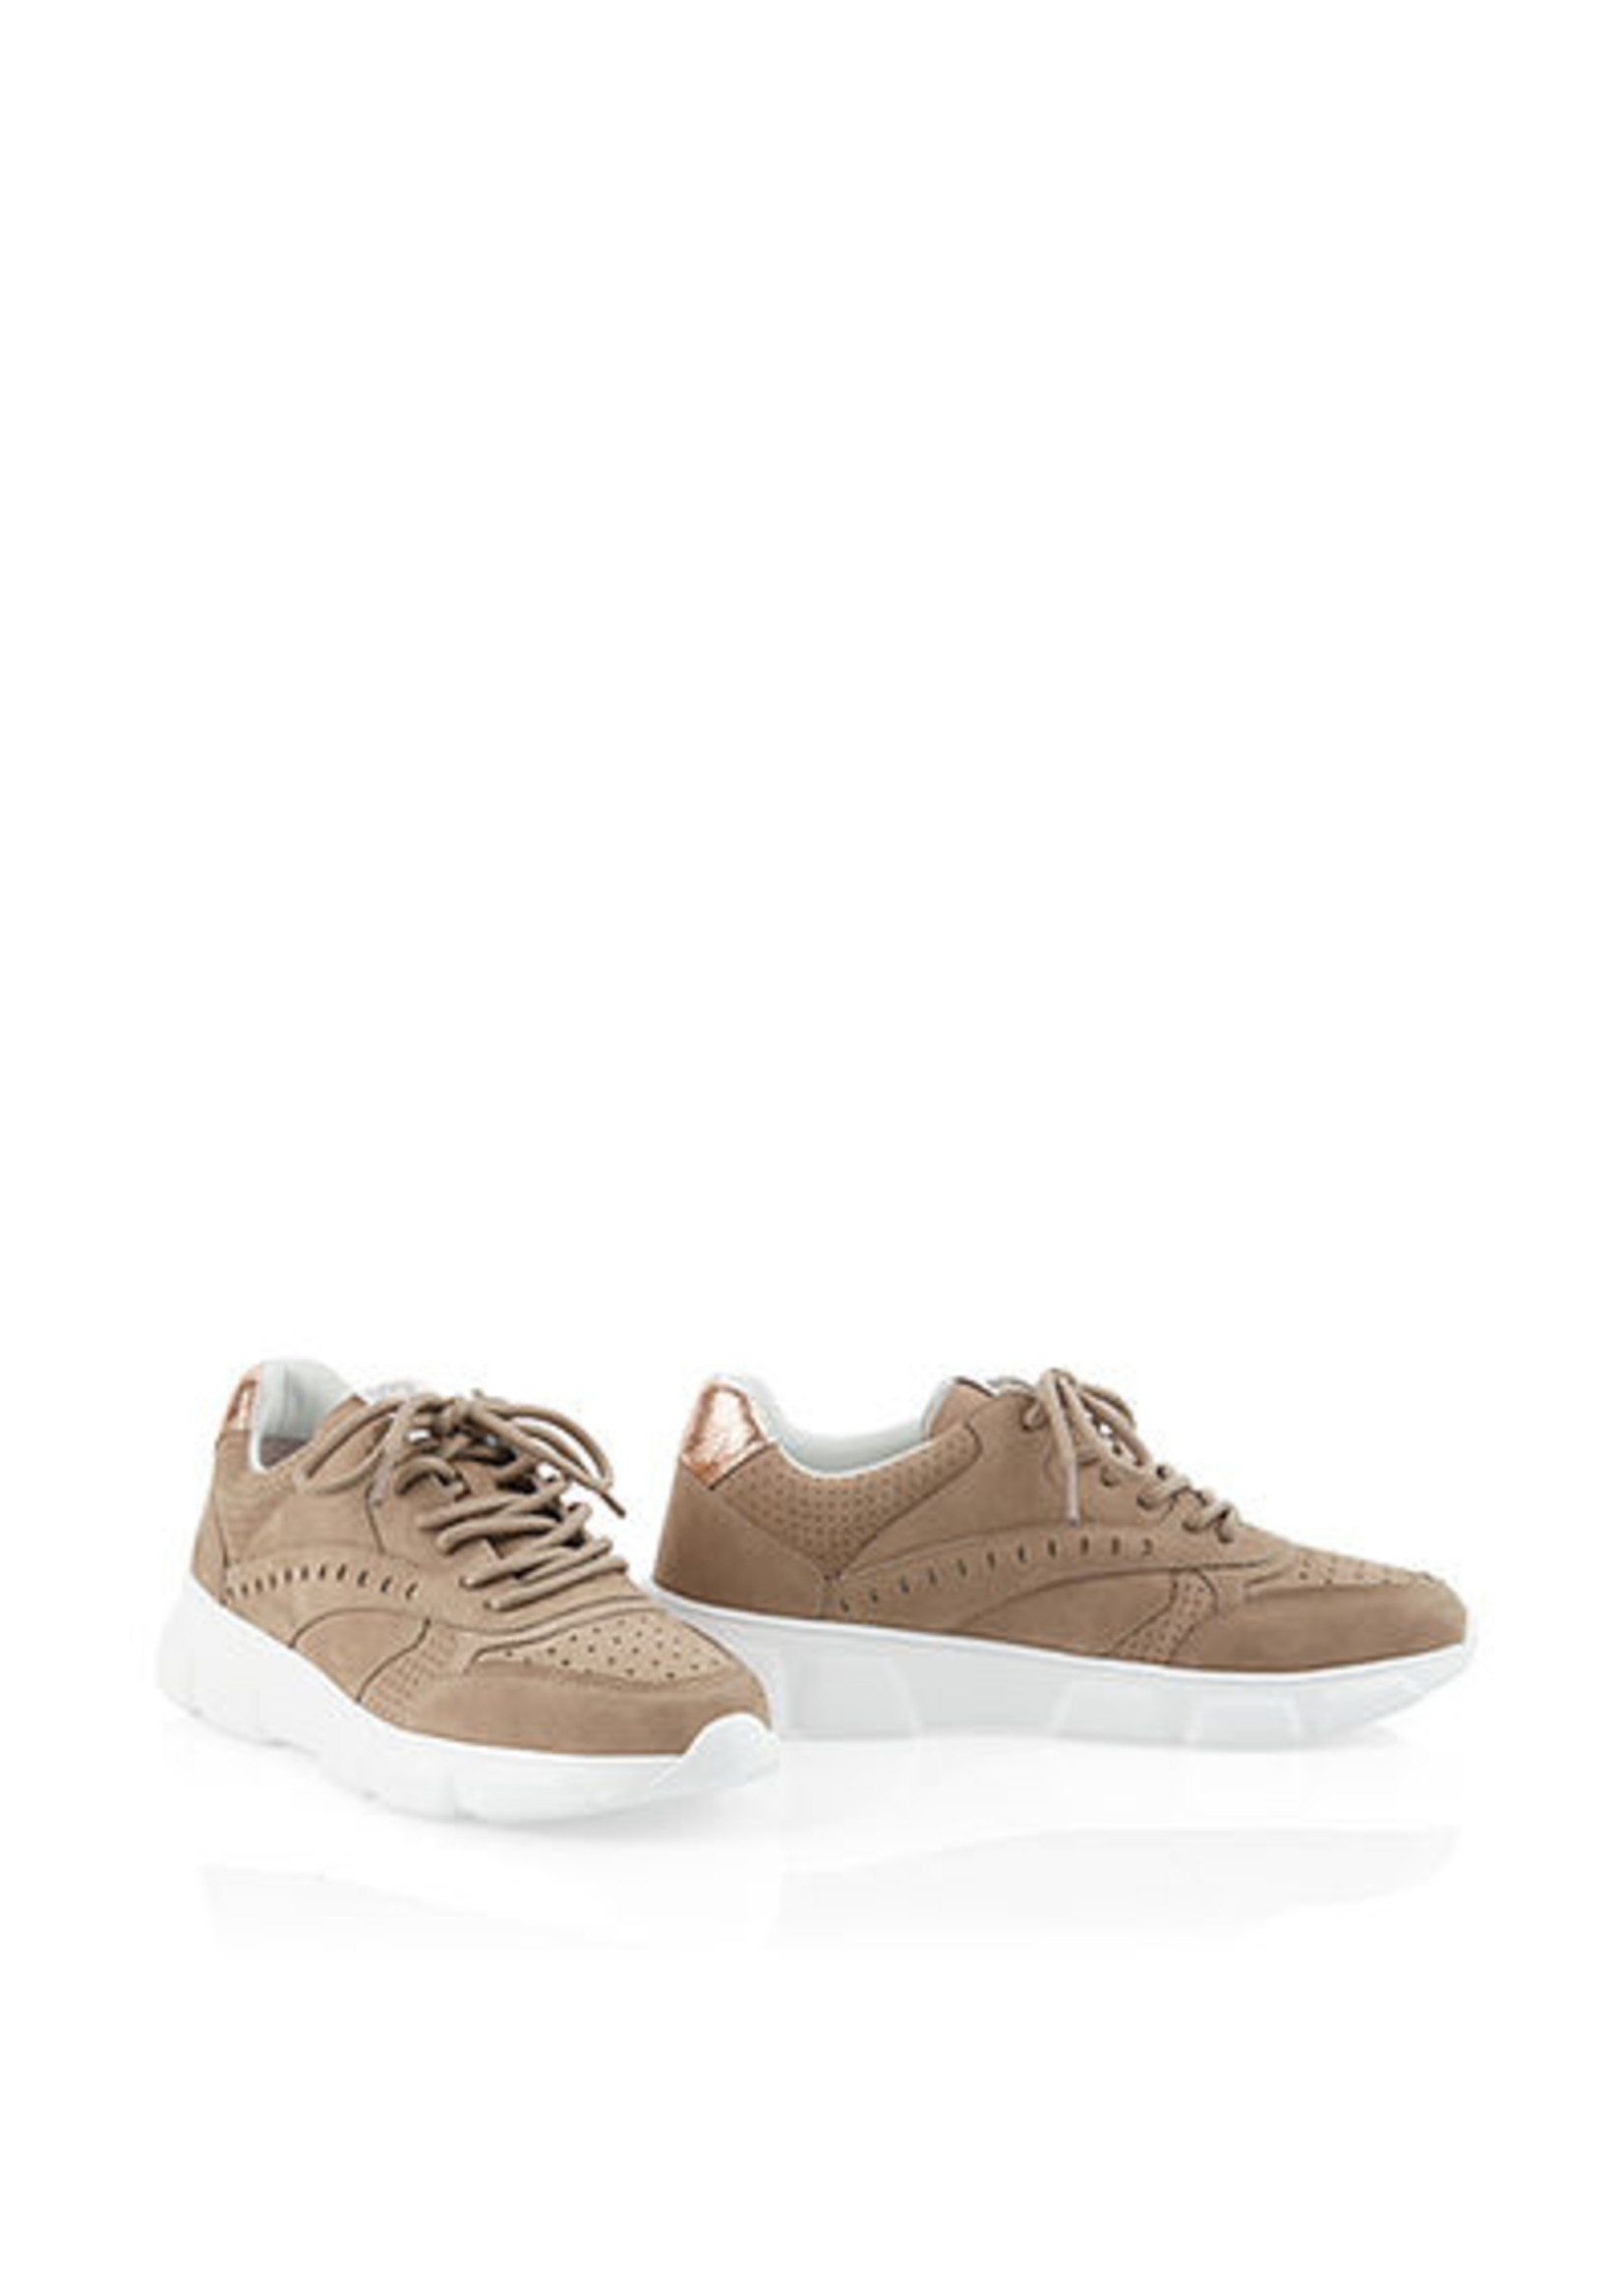 Marccain Bags & Shoes Sneaker RB SH.02 L20 light stone